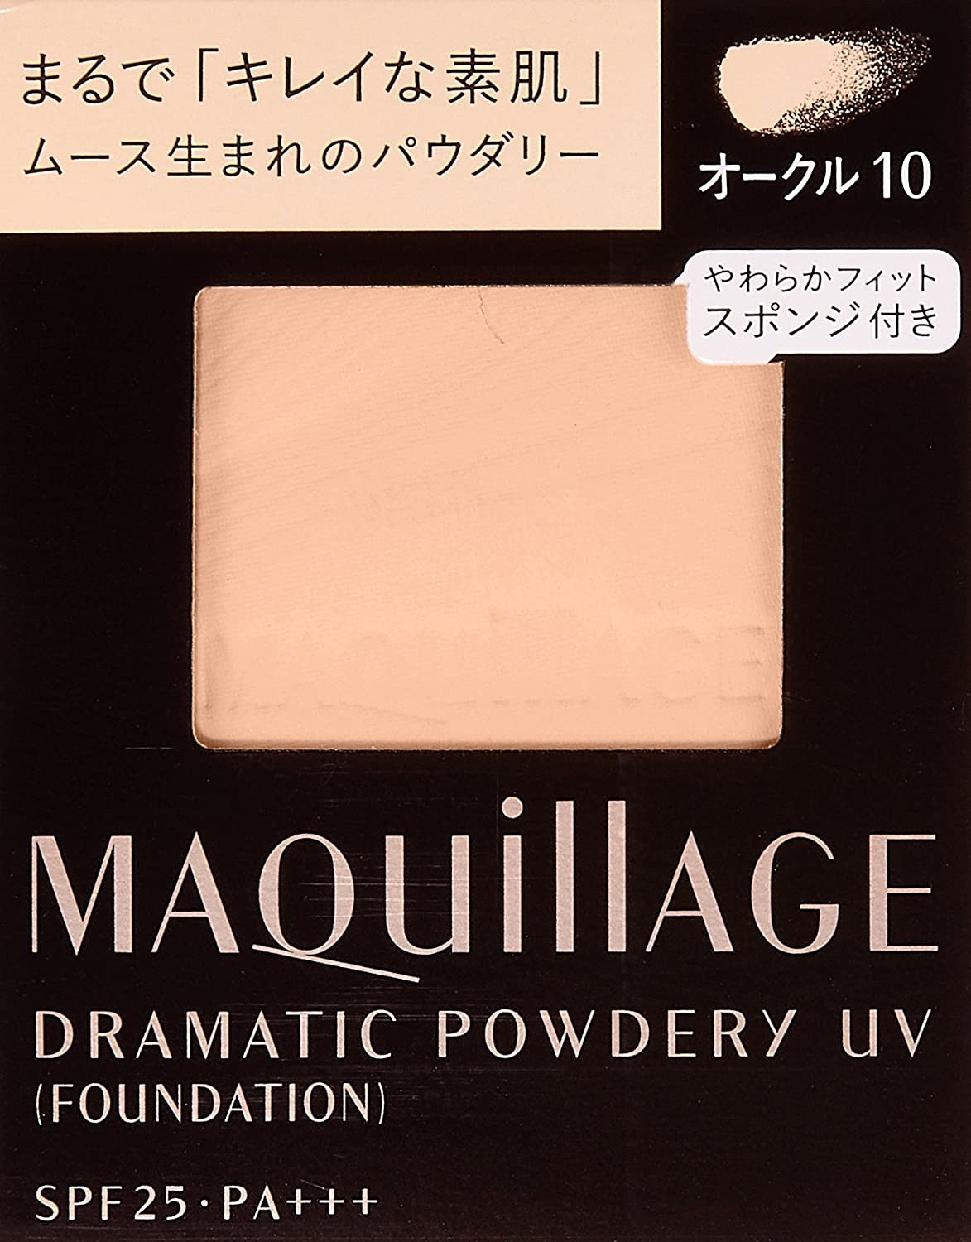 MAQuillAGE(マキアージュ) ドラマティックパウダリー UVの商品画像9